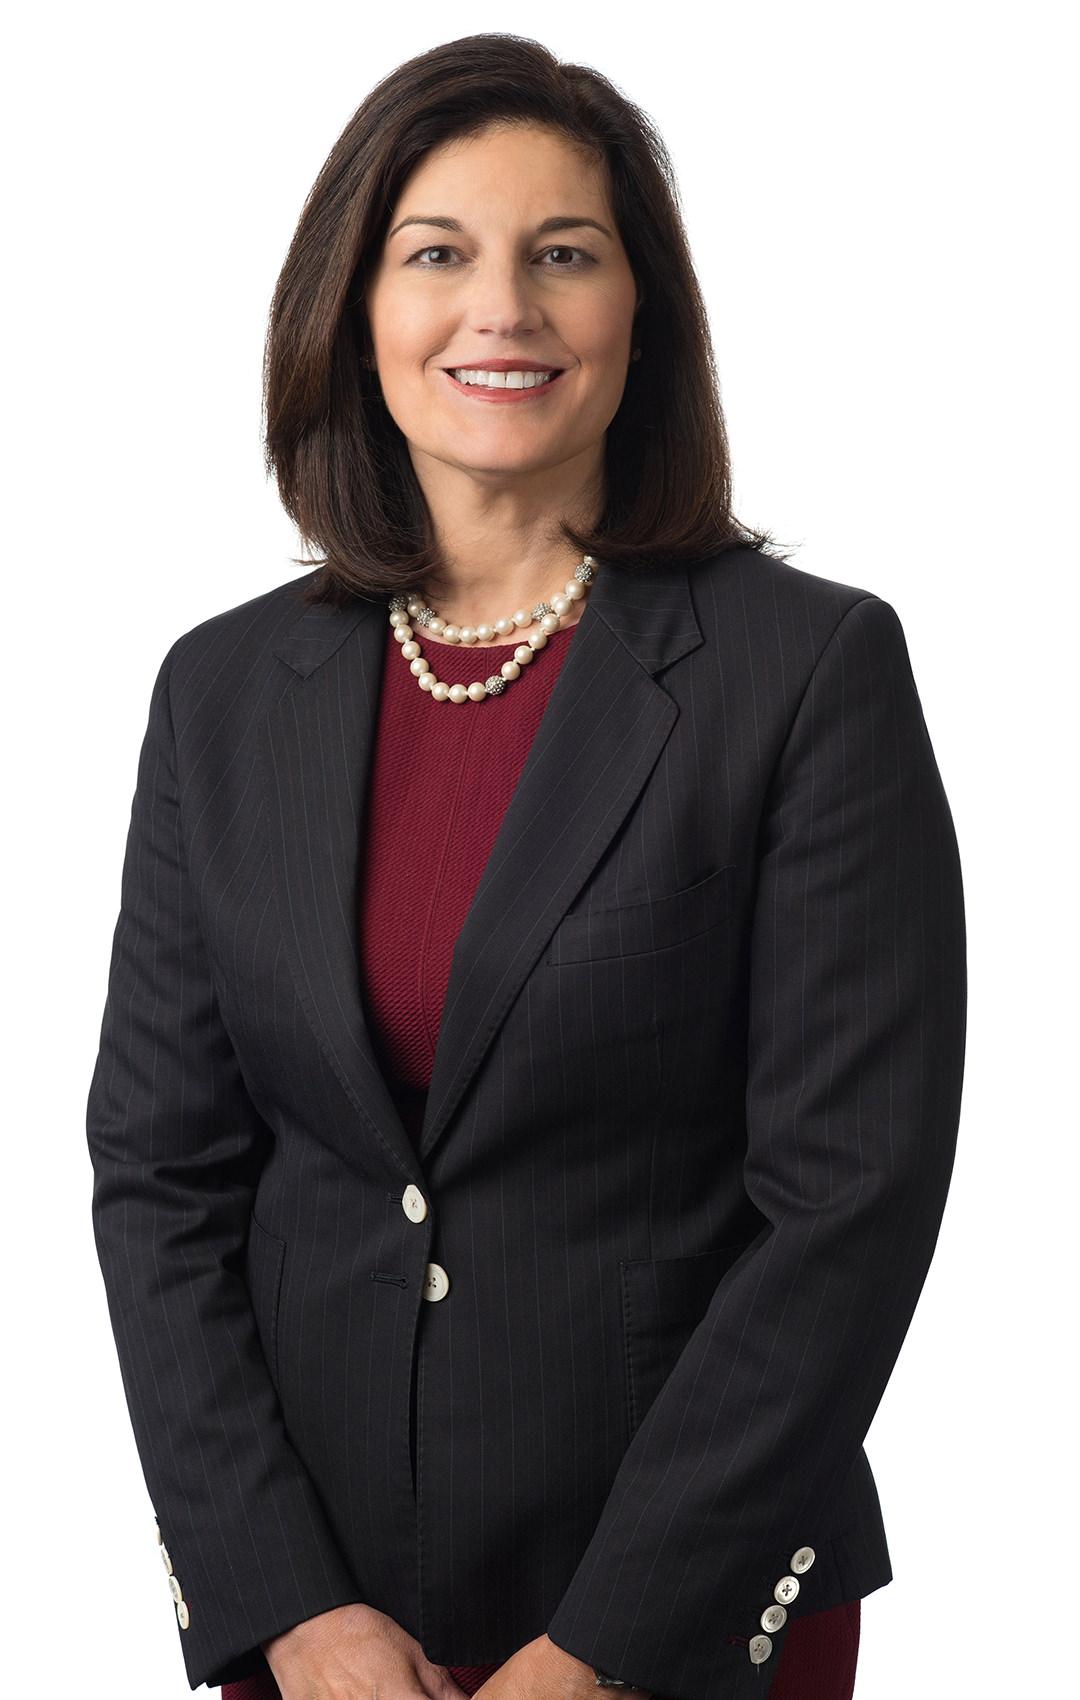 Mary S. Diemer